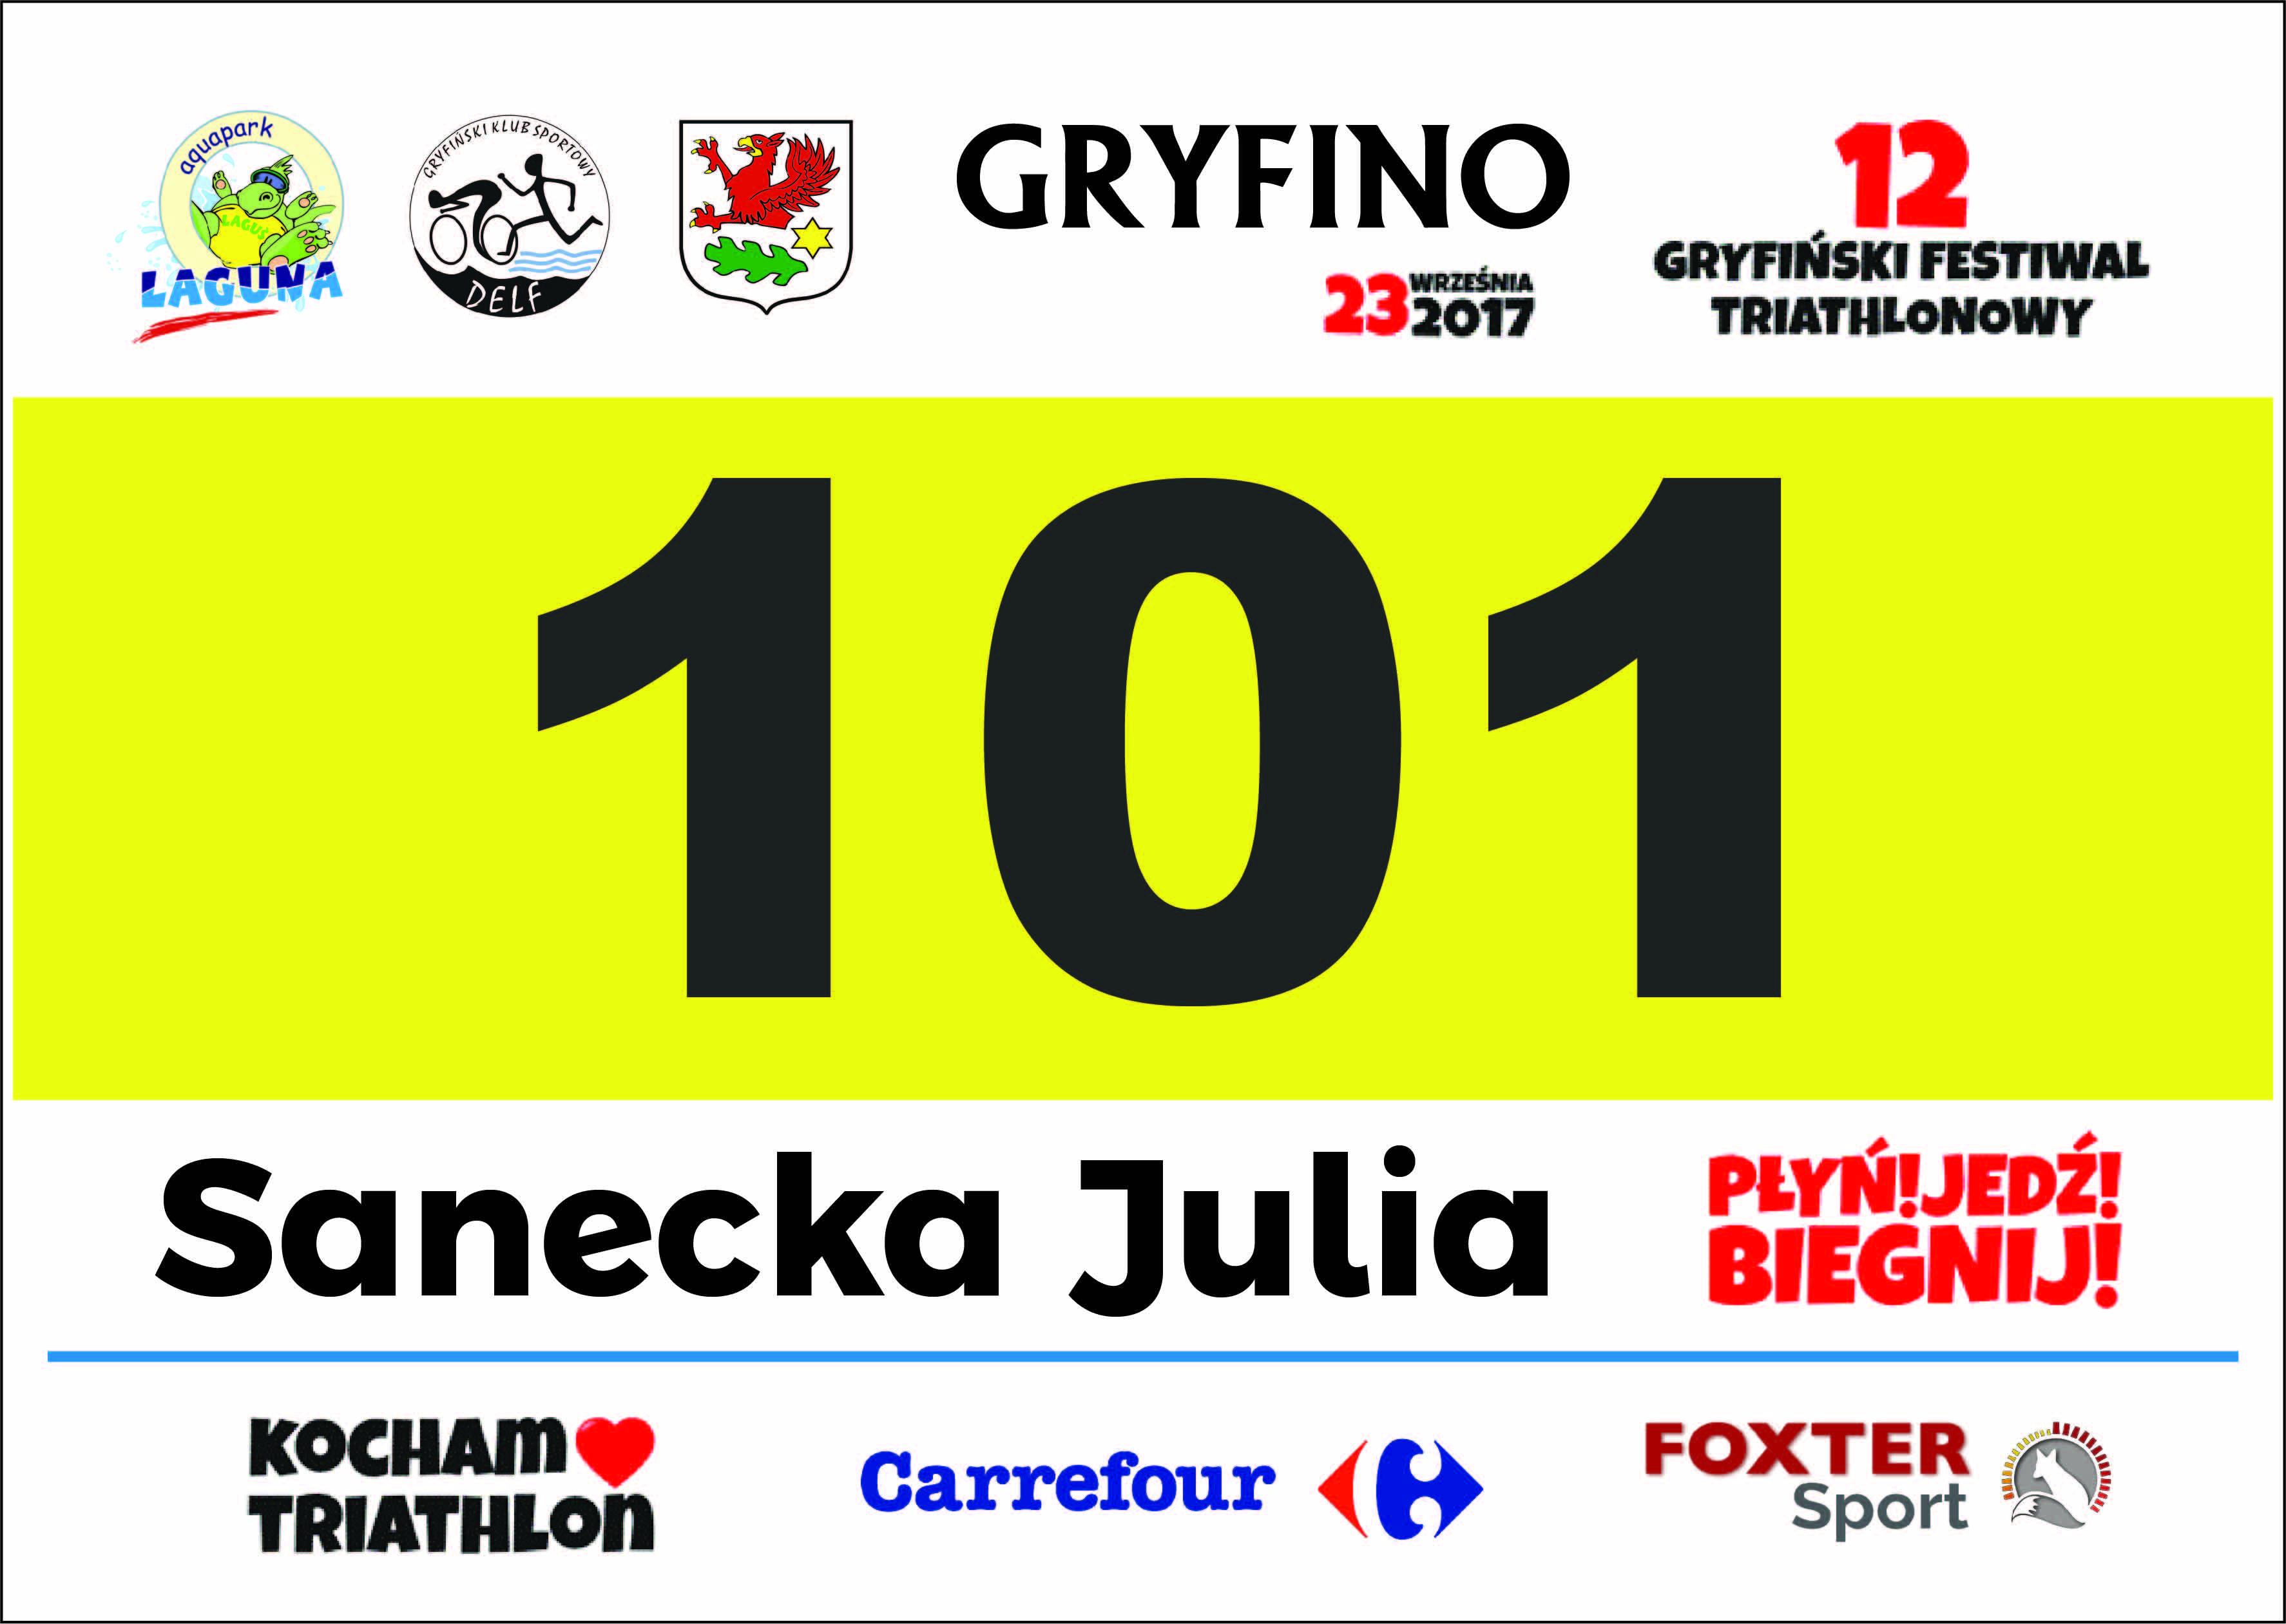 Numery startowe 12 Festiwalu Triathlonowego Kocham Triathlon